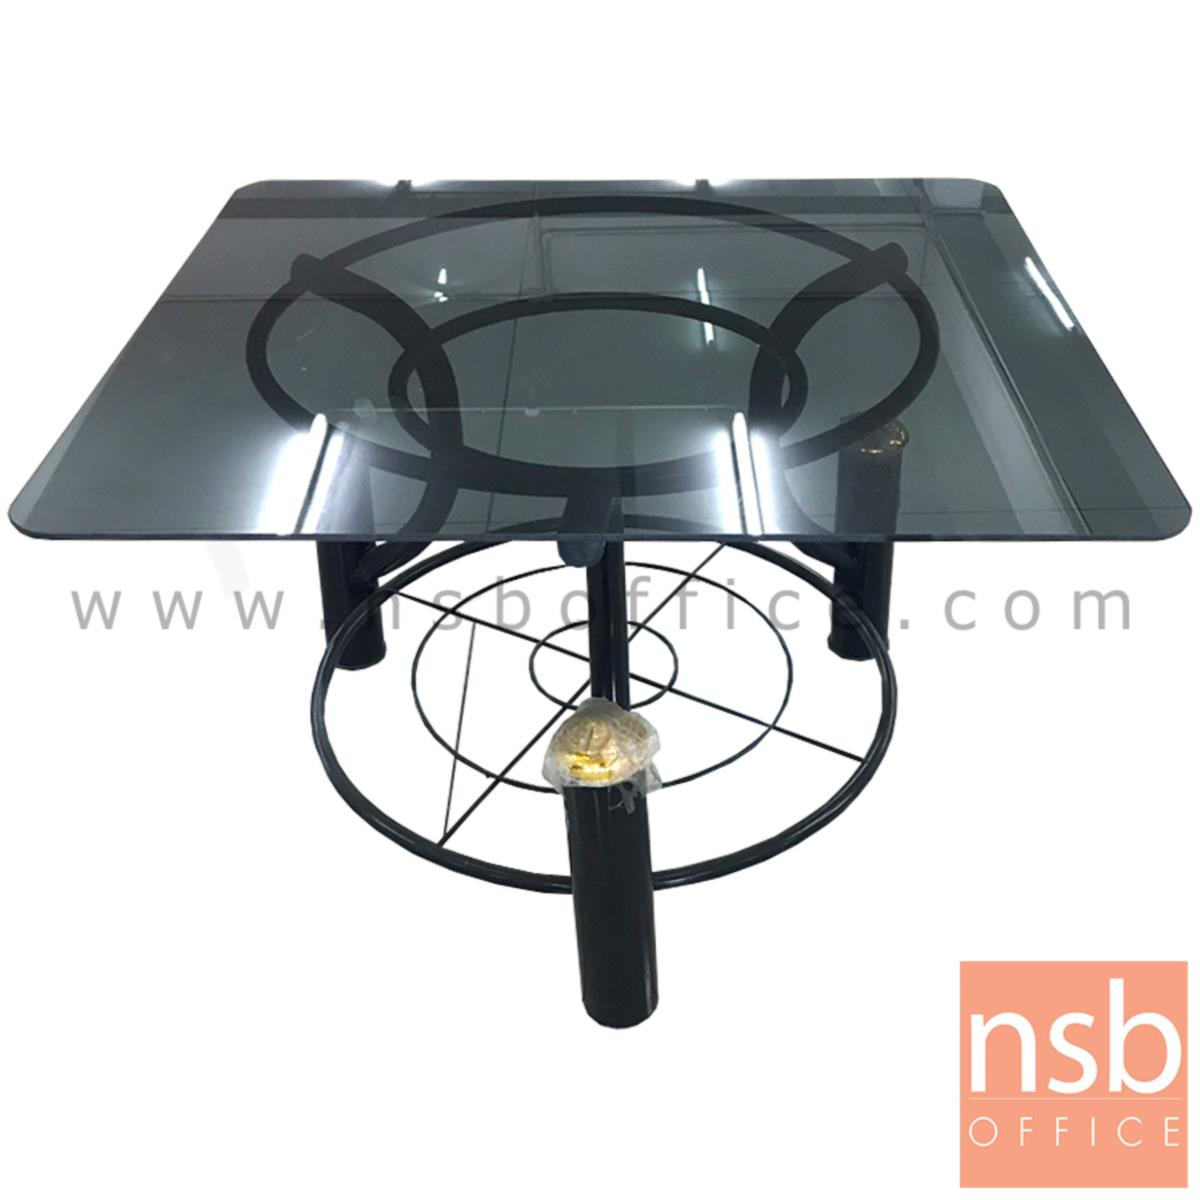 L01A140:โต๊ะเหลี่ยมโมเดิร์นกระจก  ขนาด 61W*38H cm. โครงขาดำ